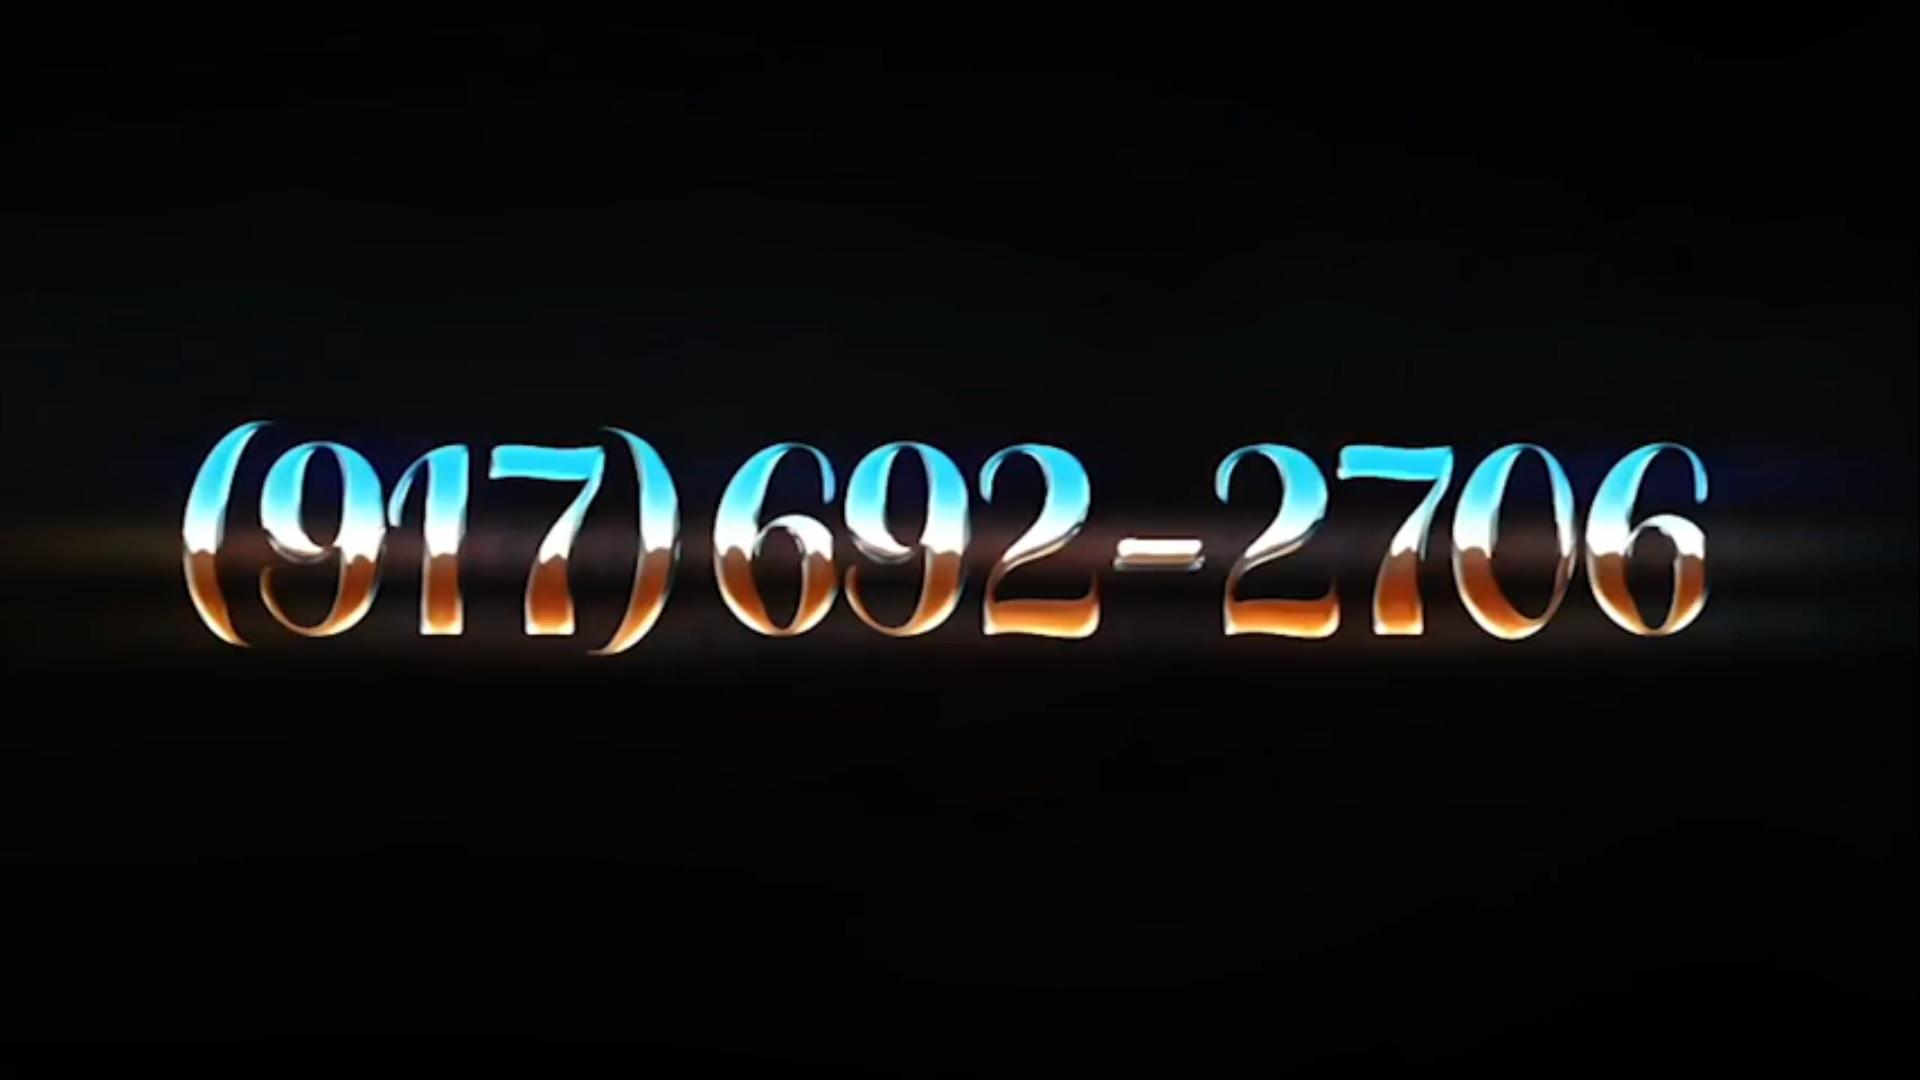 New 917 video